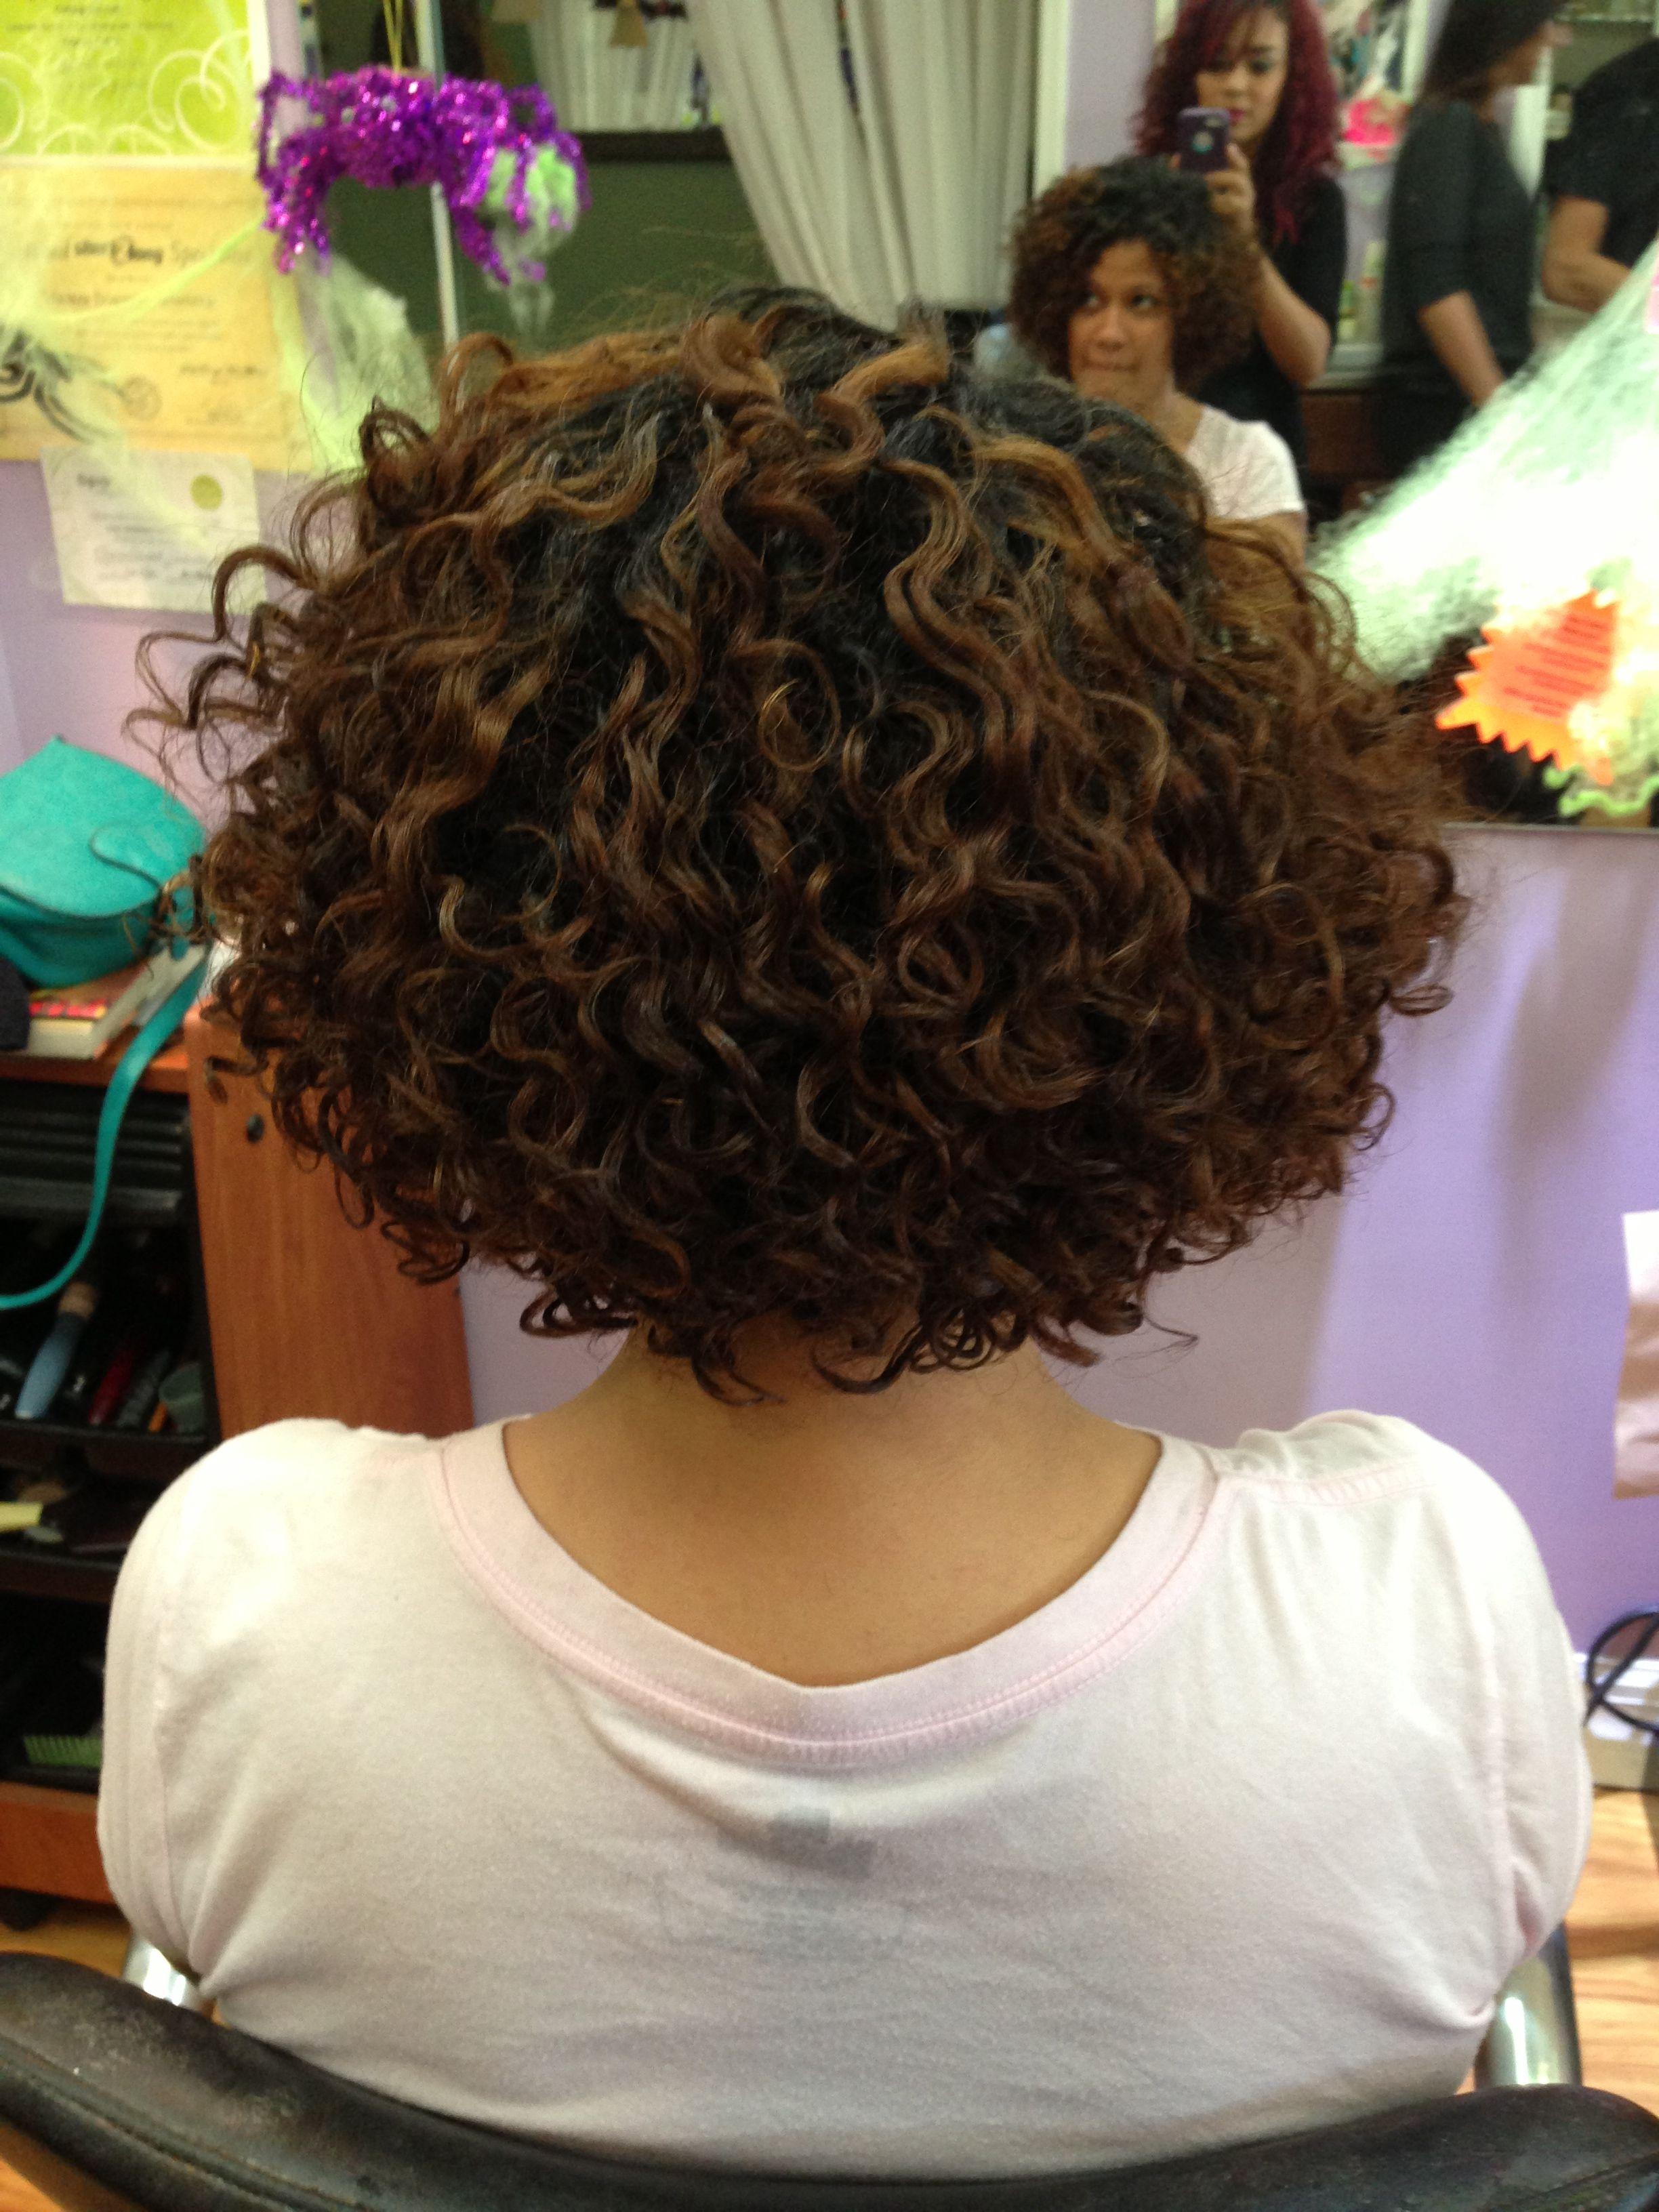 Pin by Maritza Brigantti-Armstead on Crazy curls  Curly hair